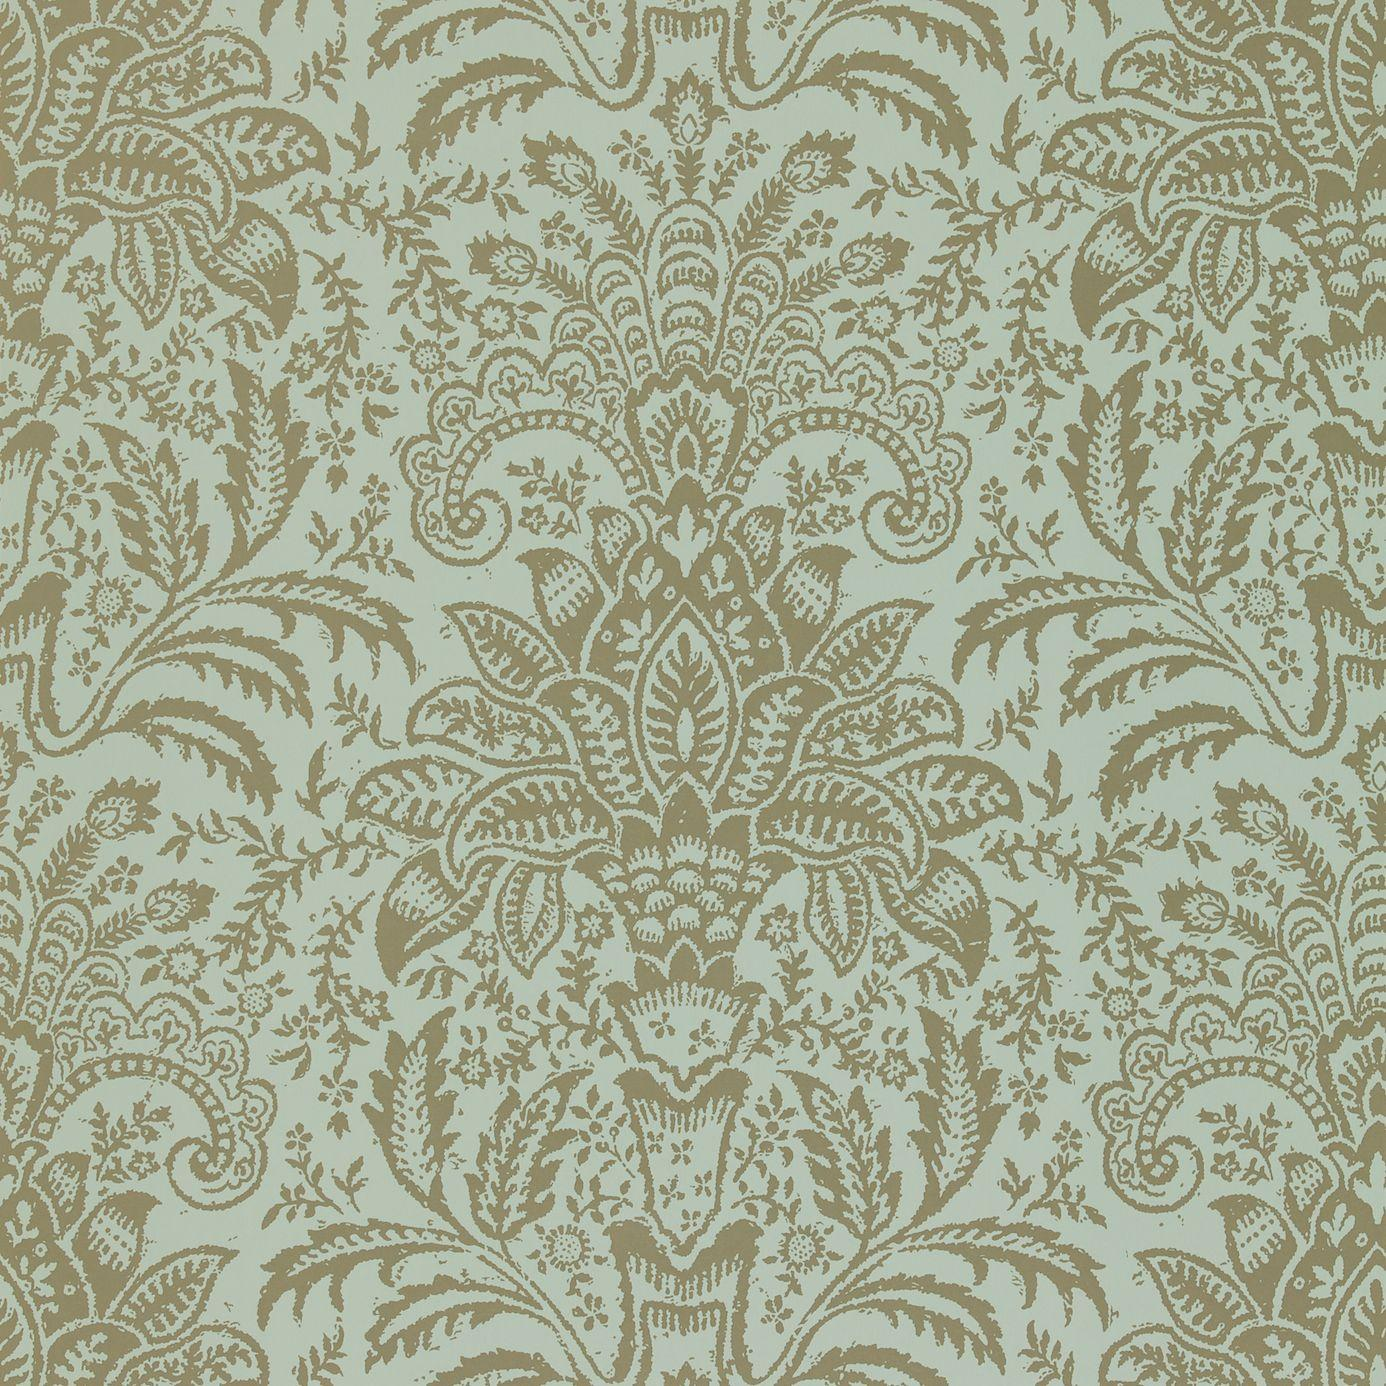 Home Wallpapers Harlequin Lucido Wallpapers Rimini Wallpaper   Silver 1386x1386